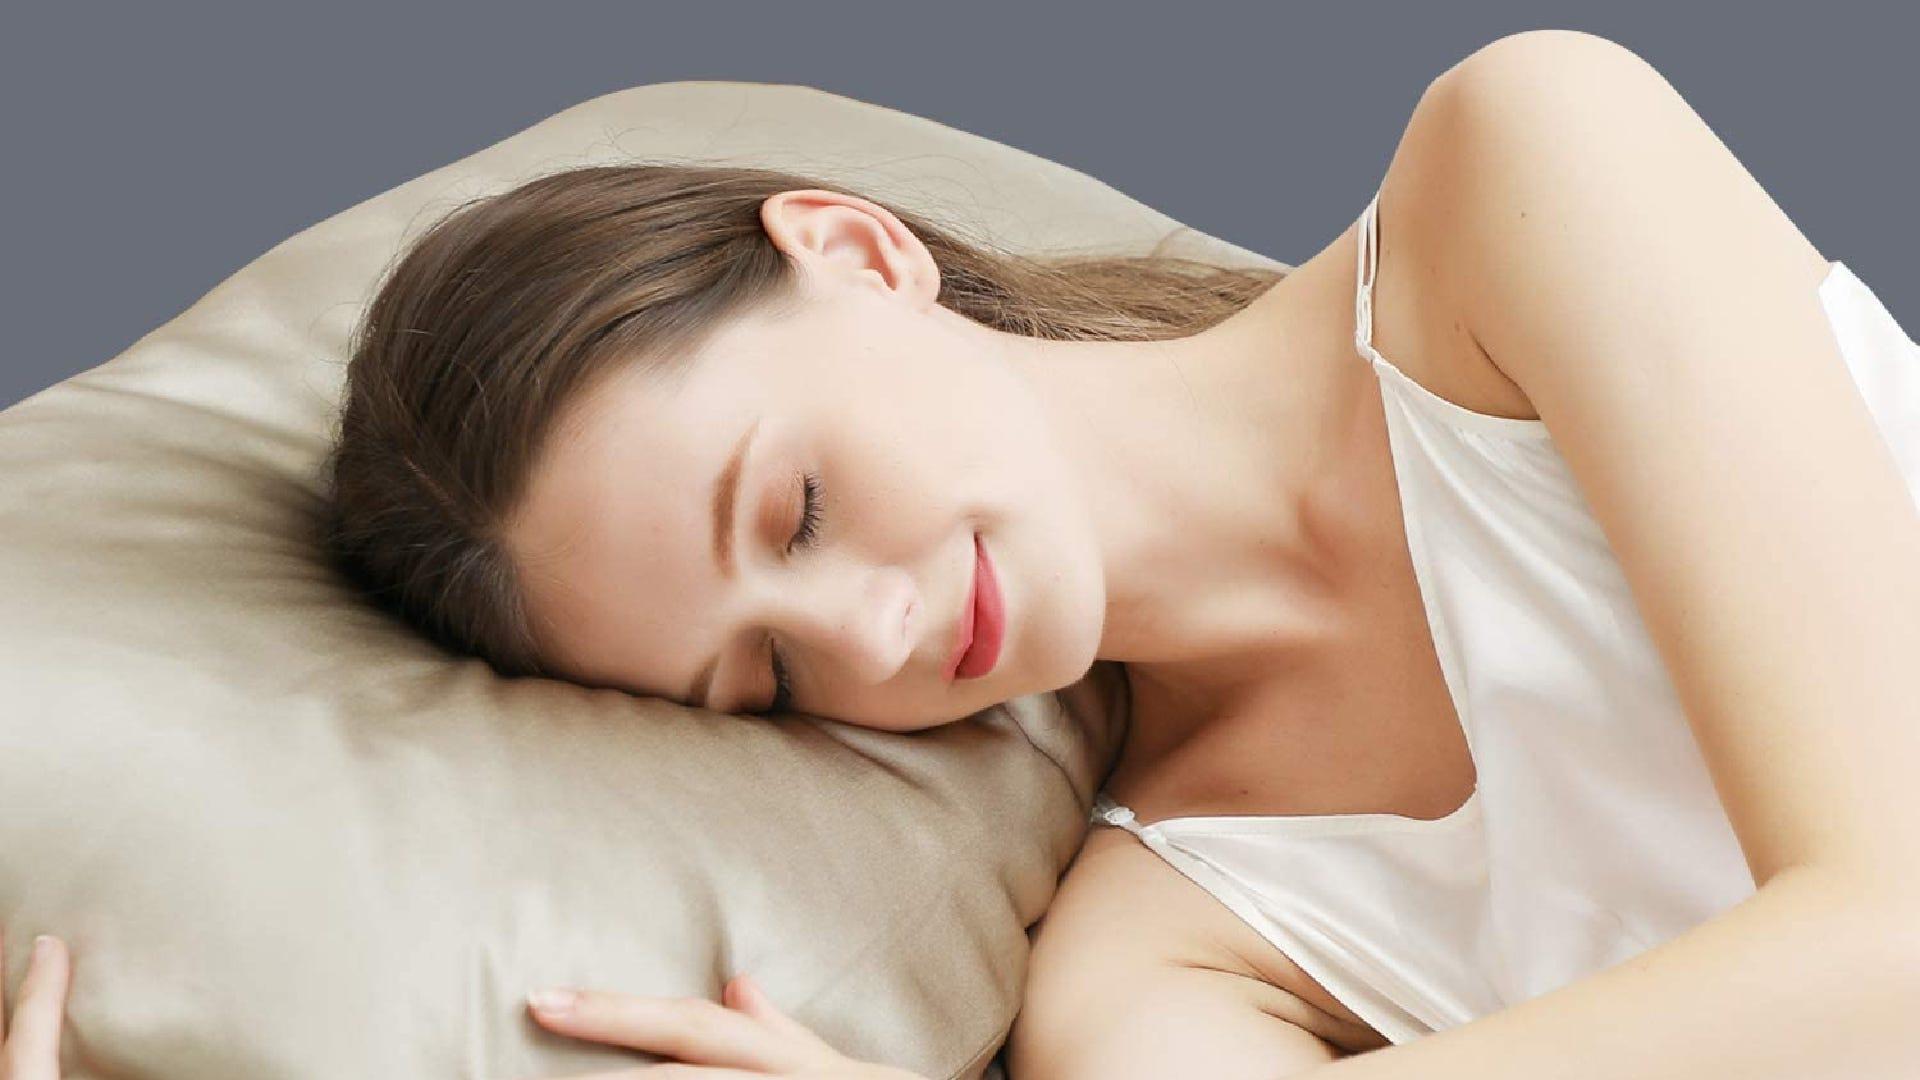 A woman sleeps on a silk pillowcase